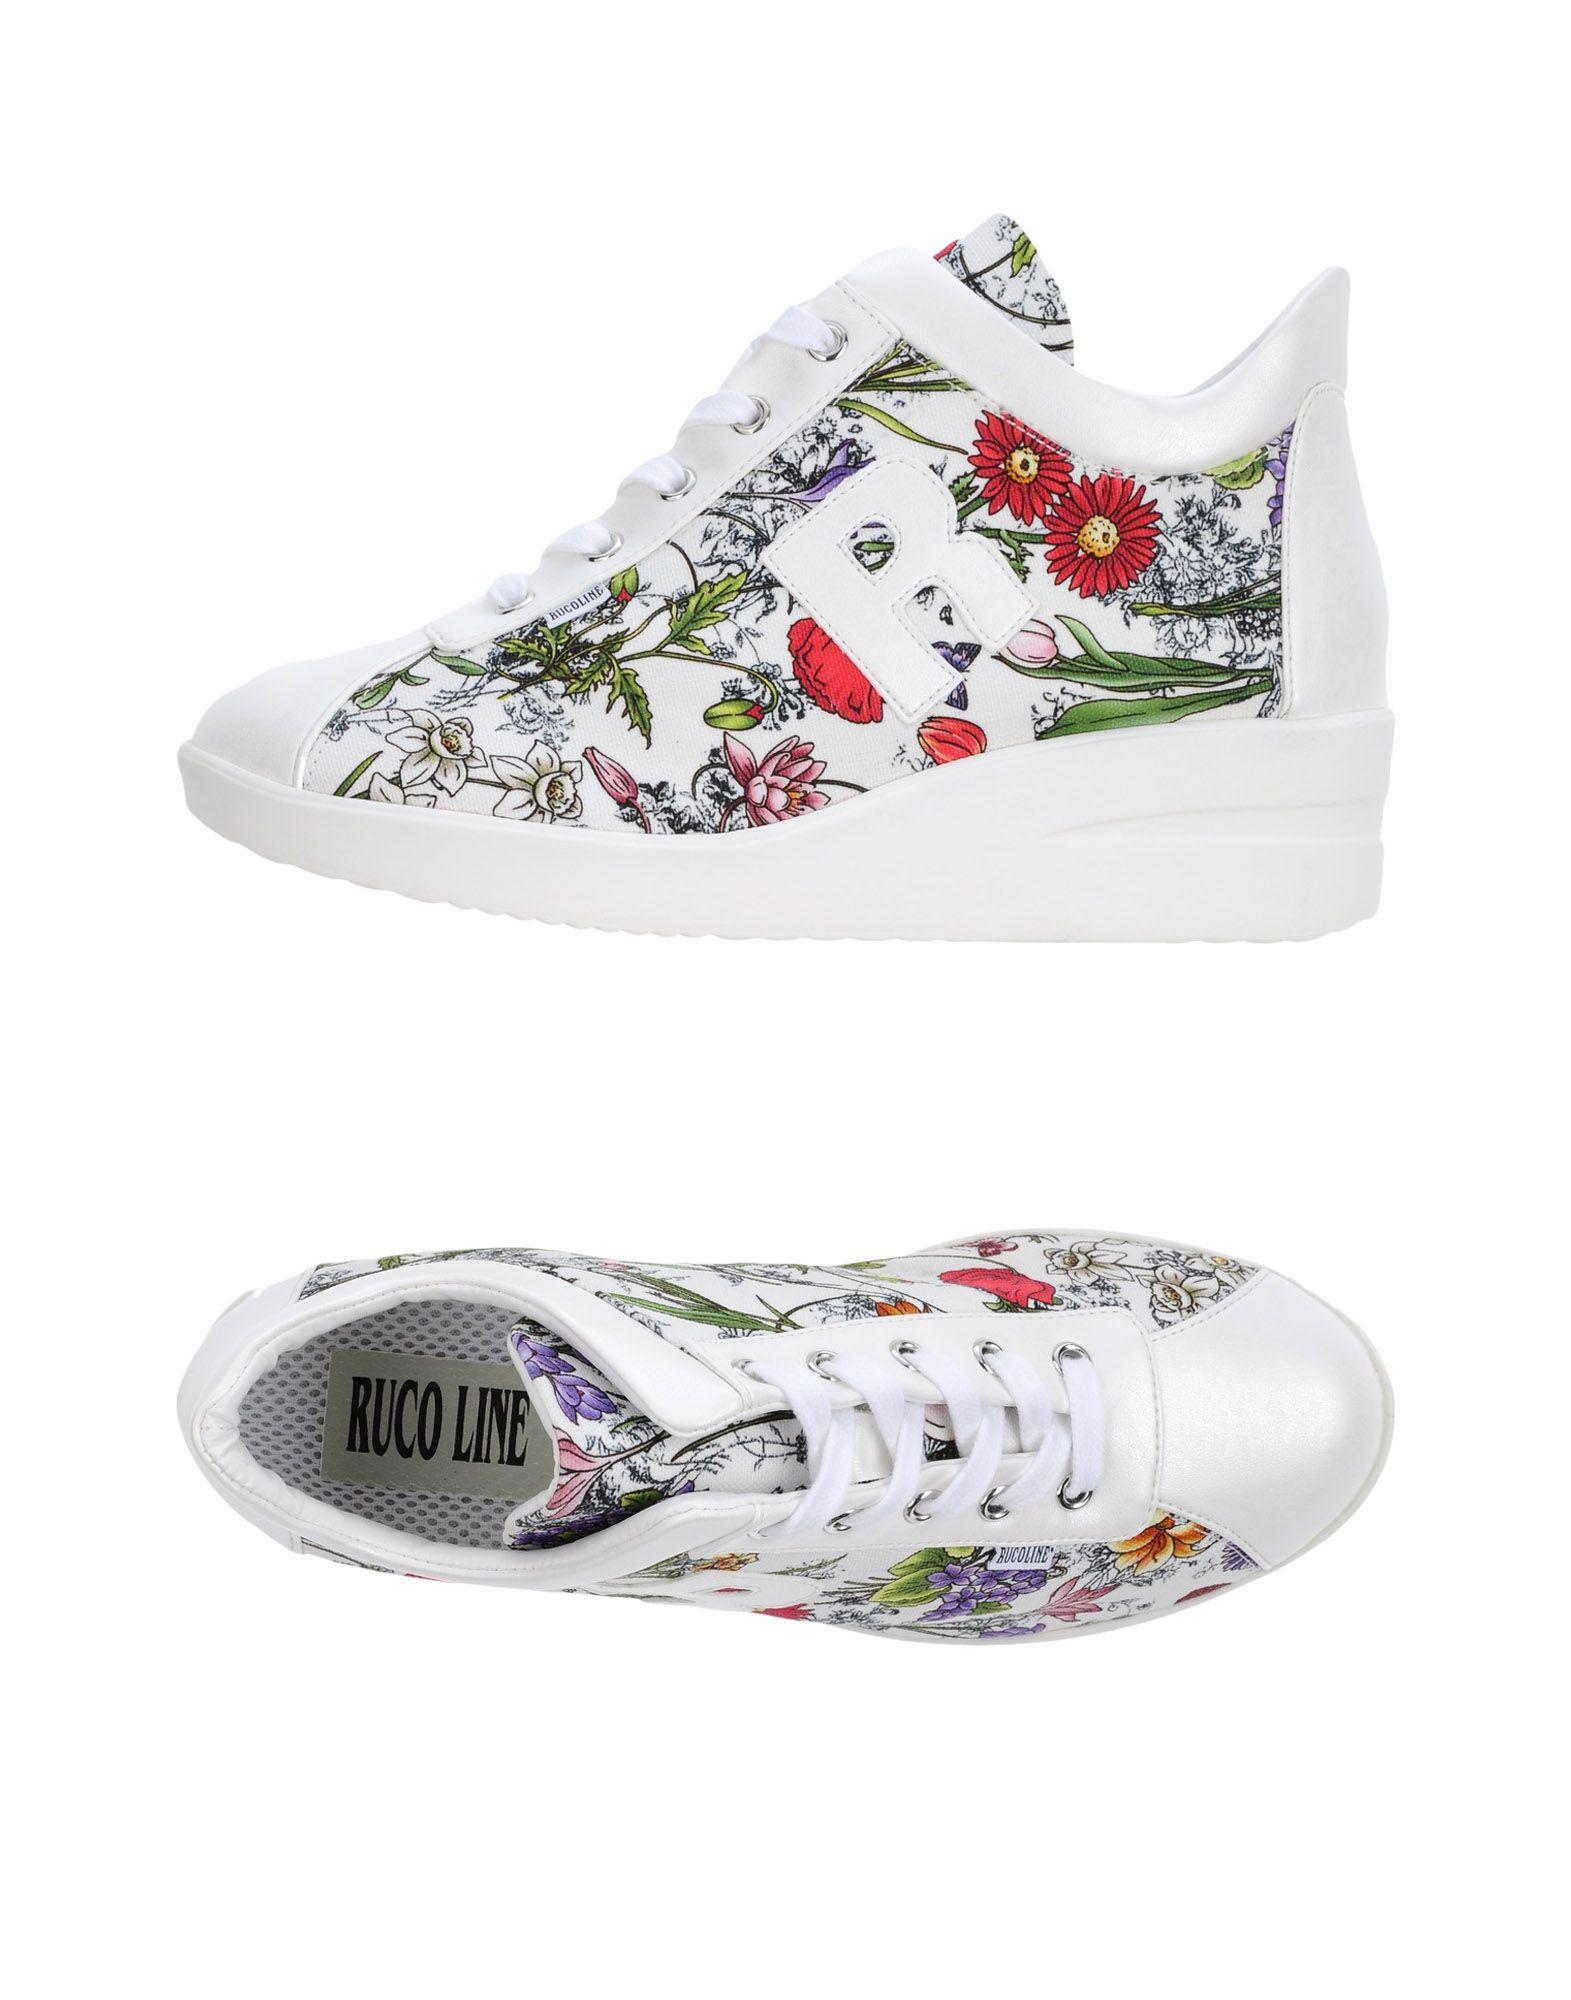 Ruco Line Sneakers Damen  11334985QN Gute Qualität beliebte Schuhe